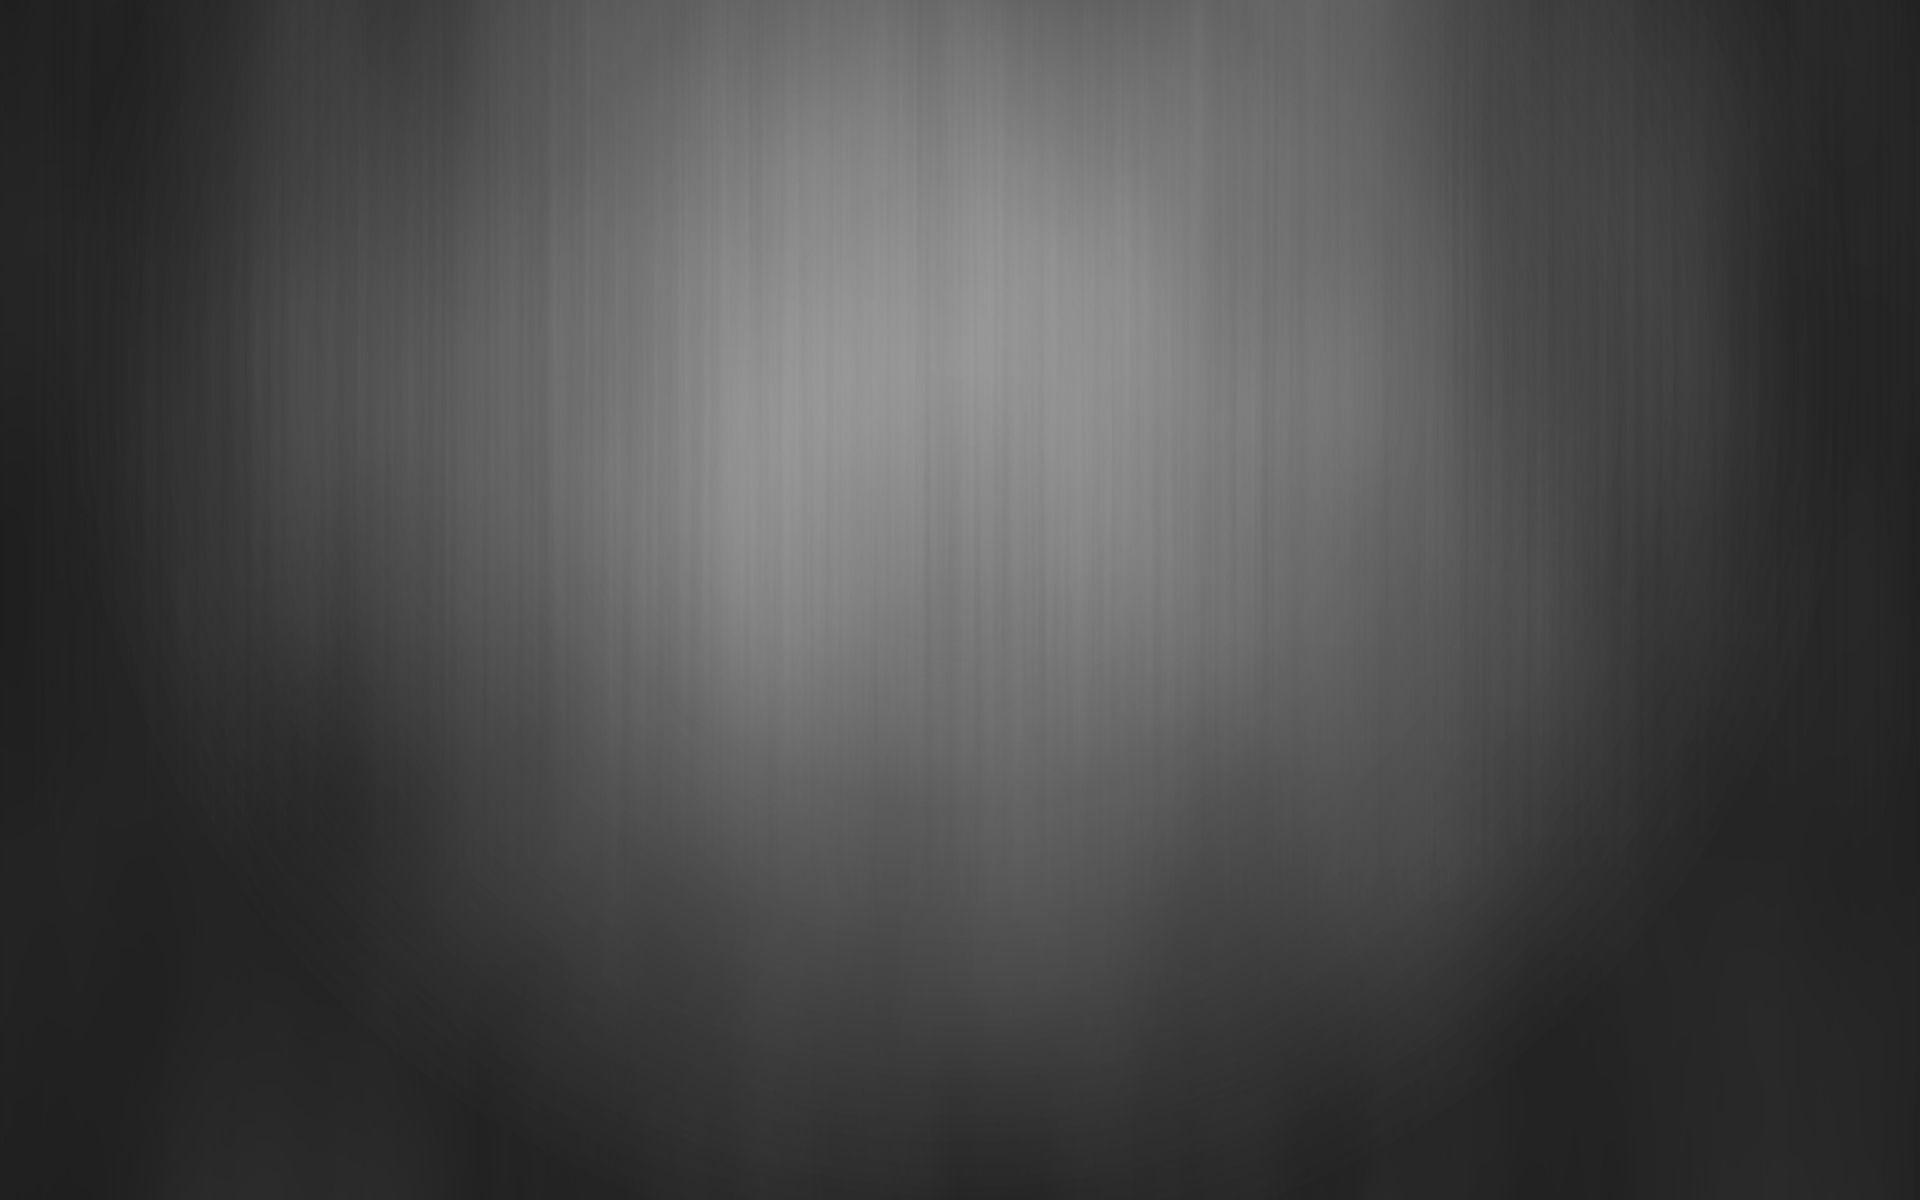 Gray Background wallpaper – 742053